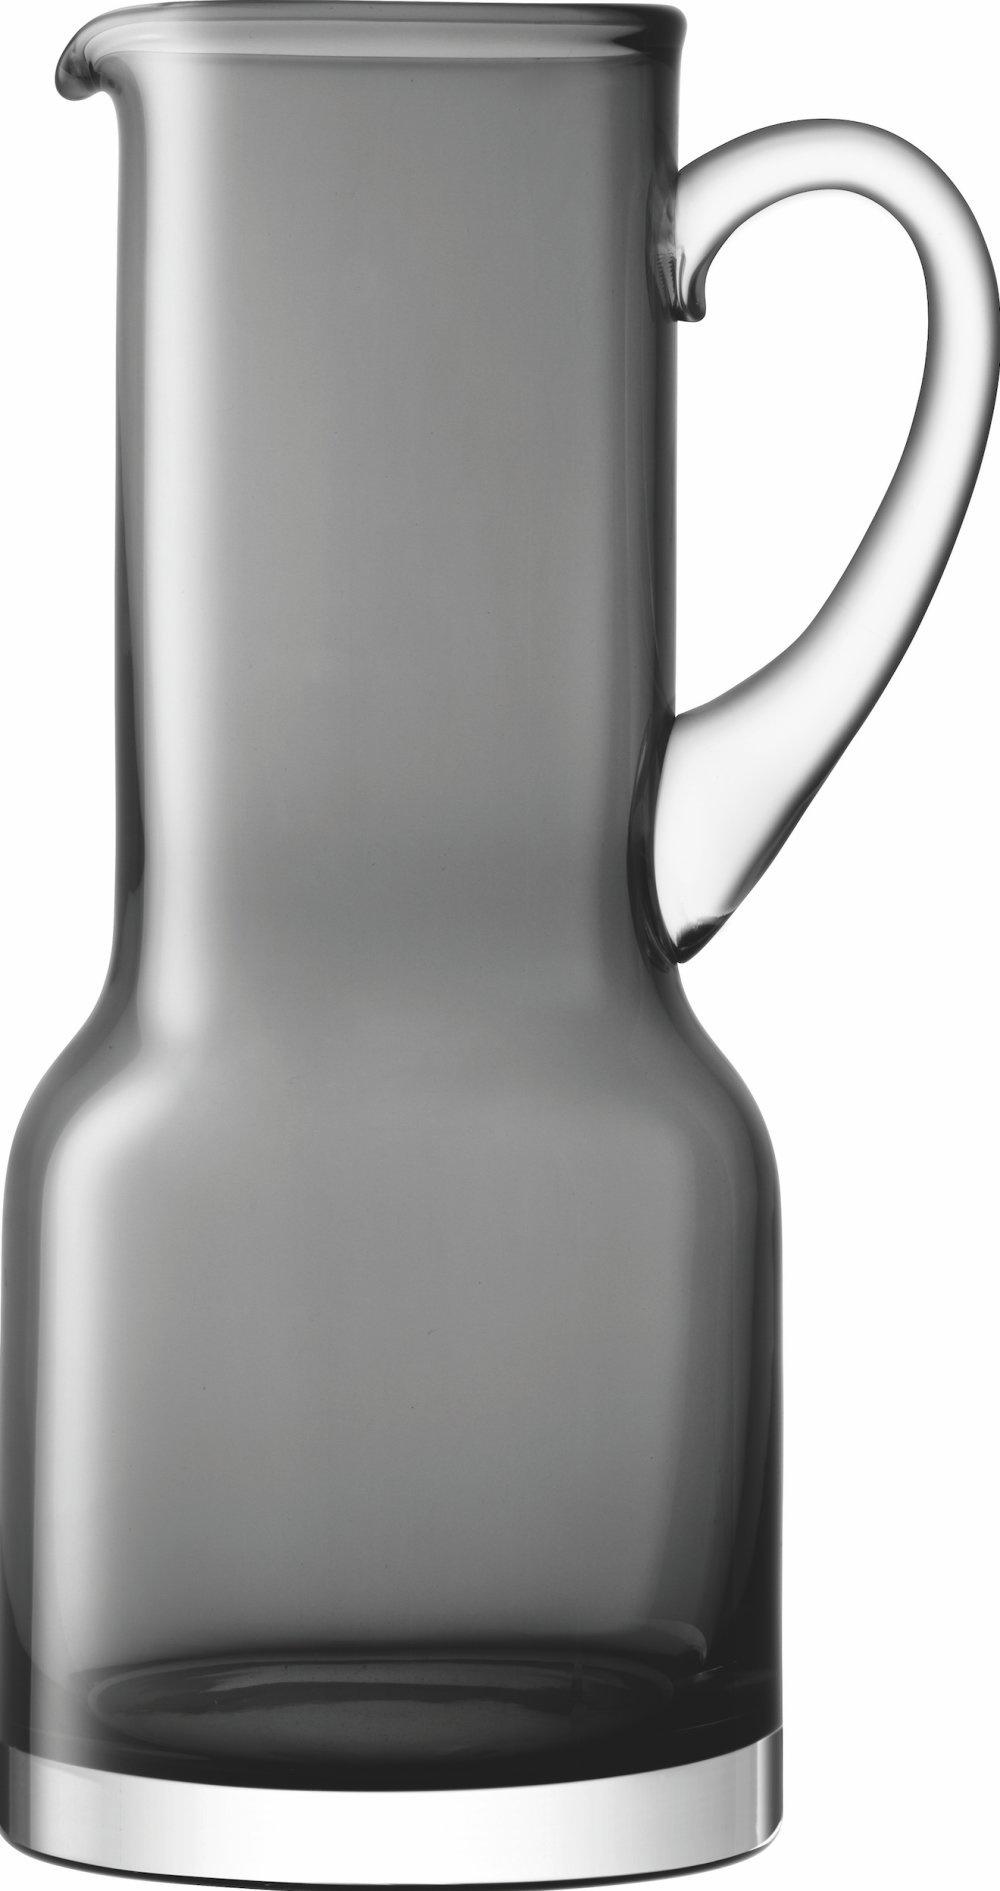 L.S.A. Utility Waterkaraf 1,35 liter